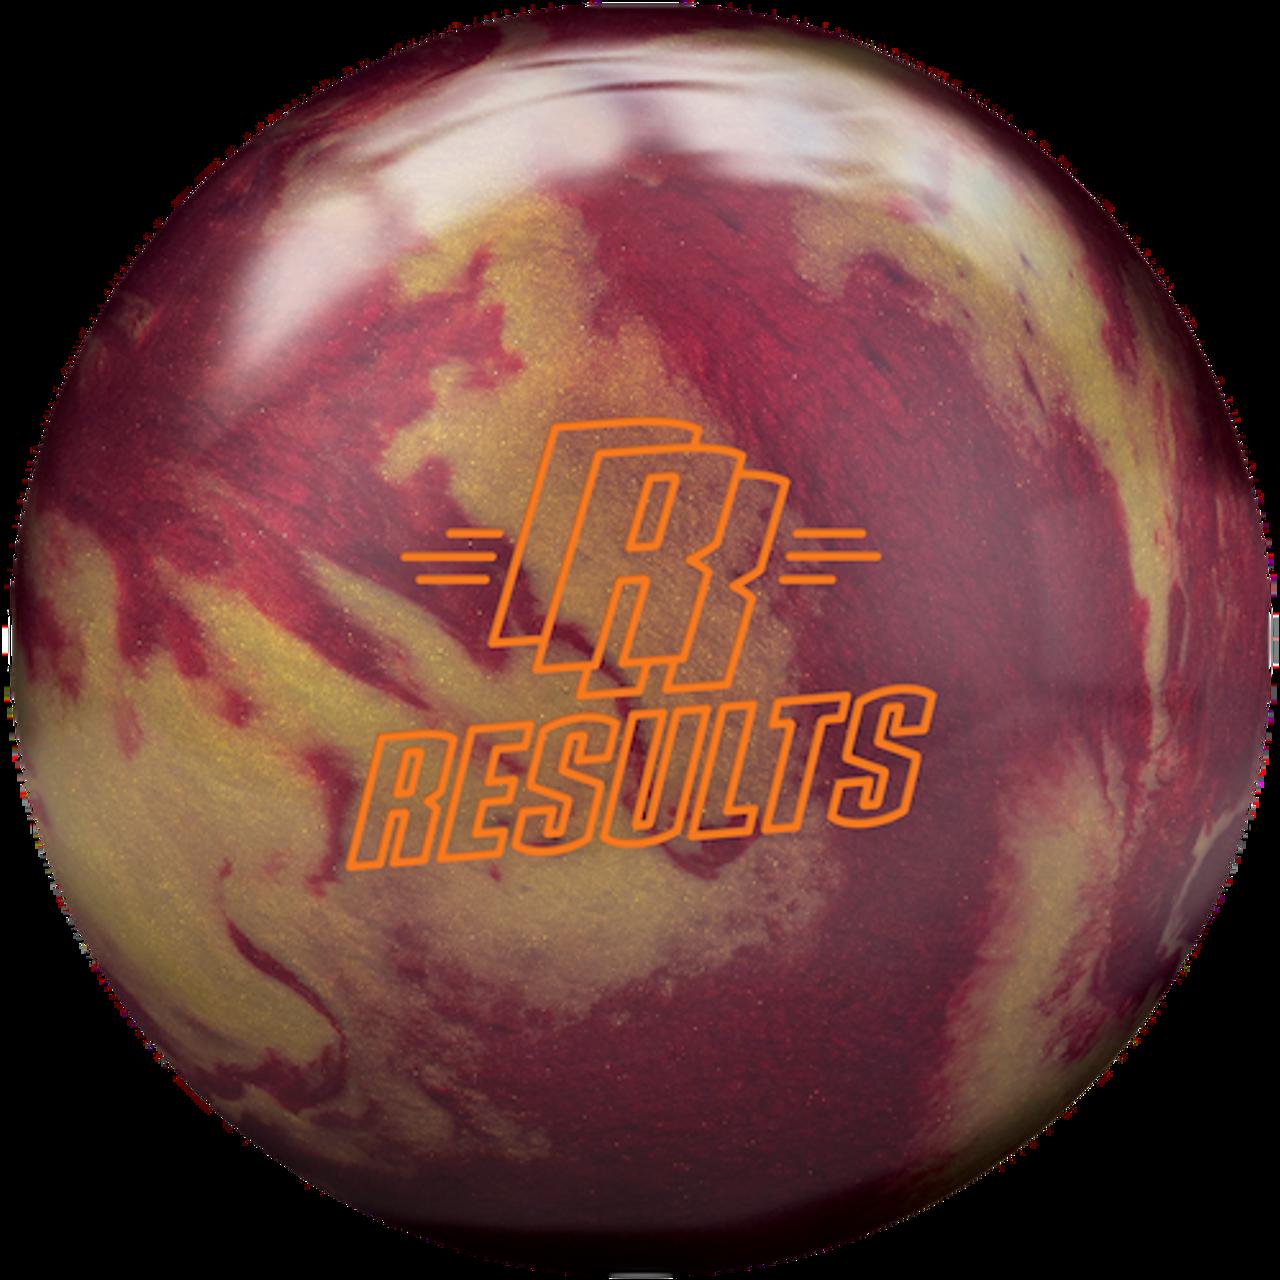 Radical Results Bowling Ball